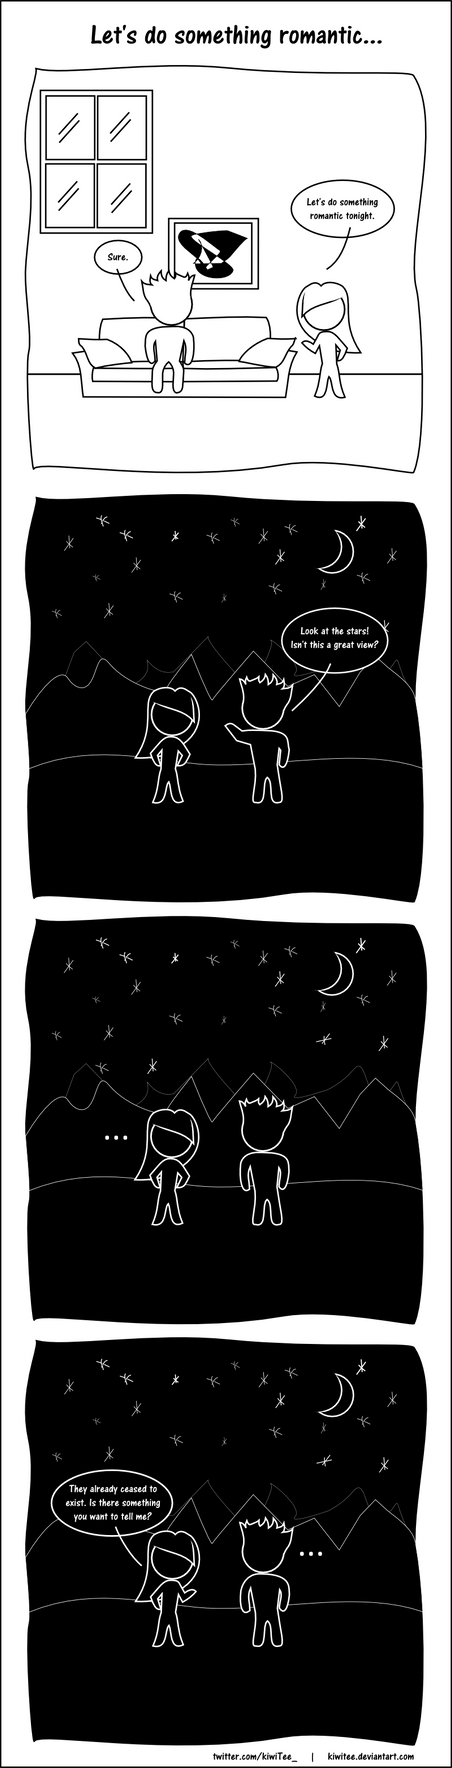 Let's Do Something Romantic by kiwitee